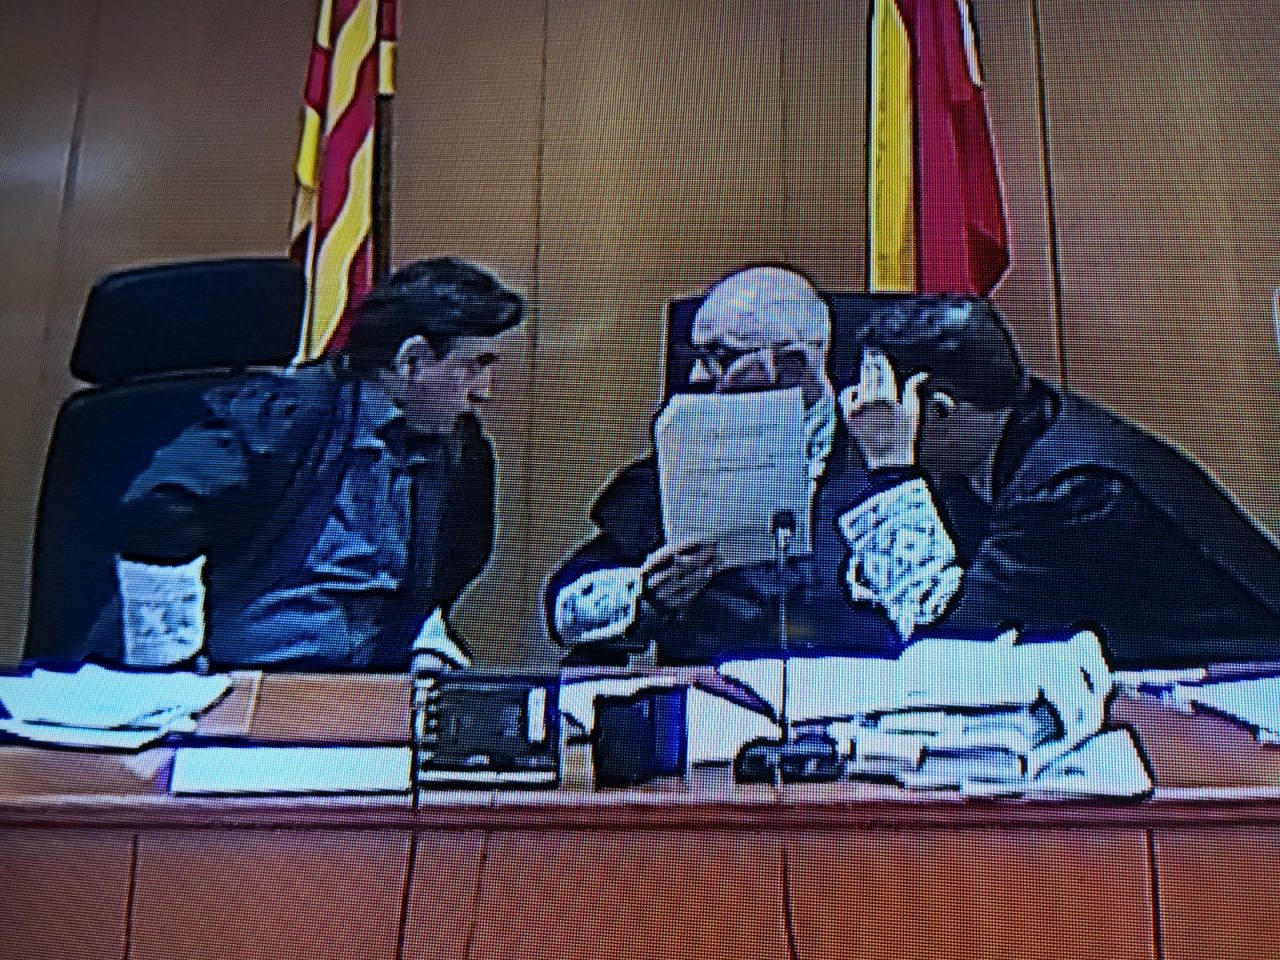 mossos_judici1-1280x960.jpg